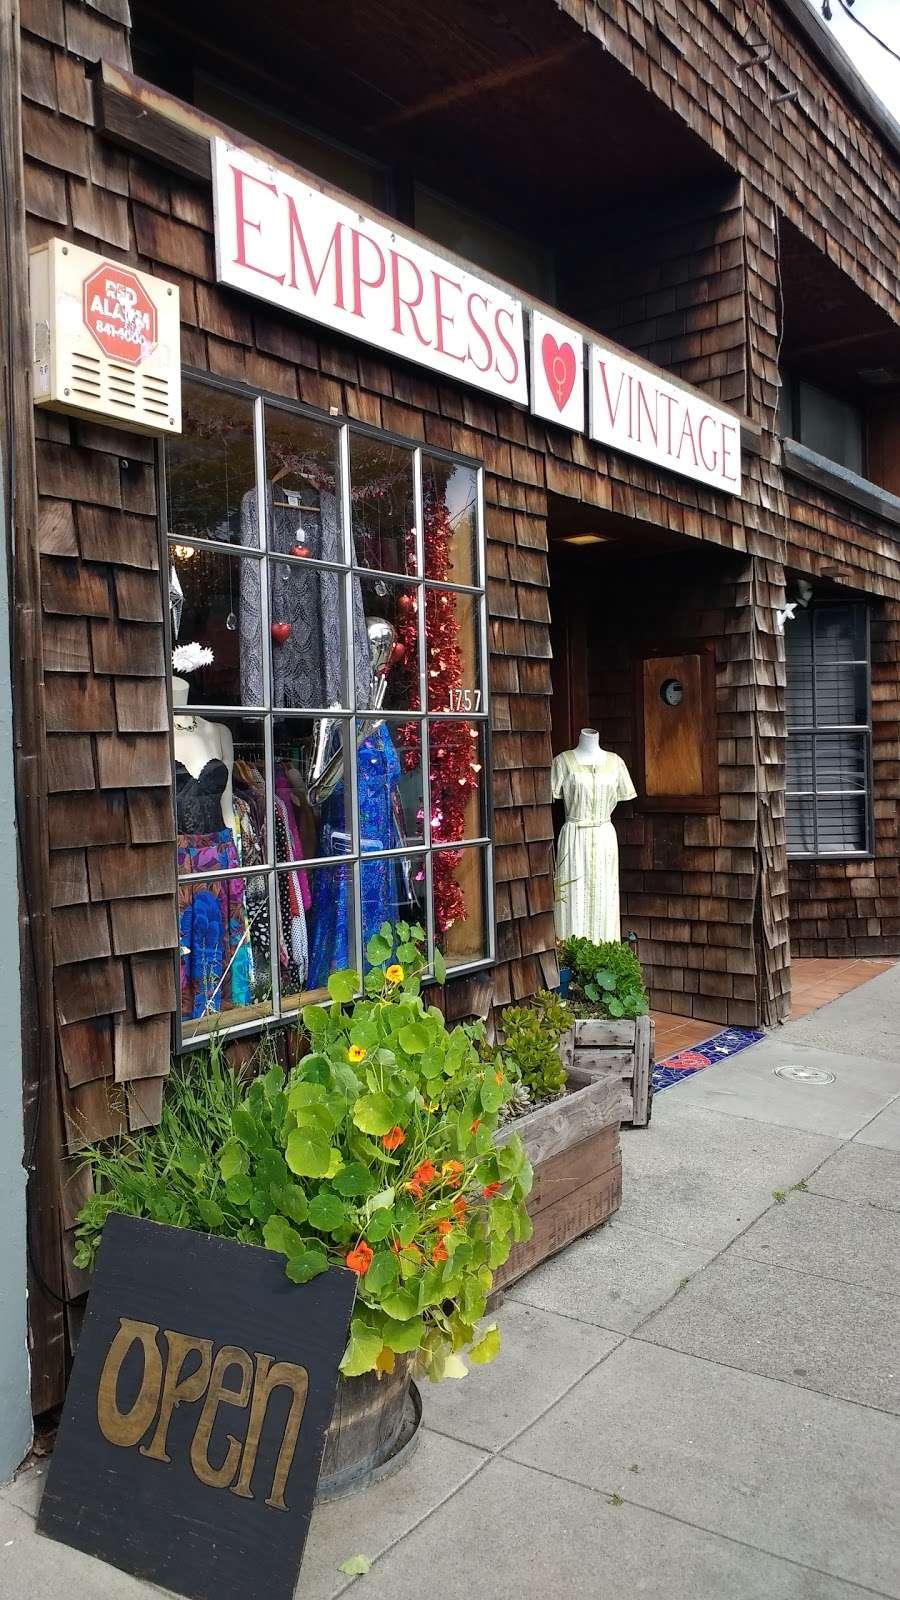 Empress Vintage - clothing store    Photo 8 of 10   Address: 1757 Alcatraz Ave, Berkeley, CA 94703, USA   Phone: (510) 542-6196